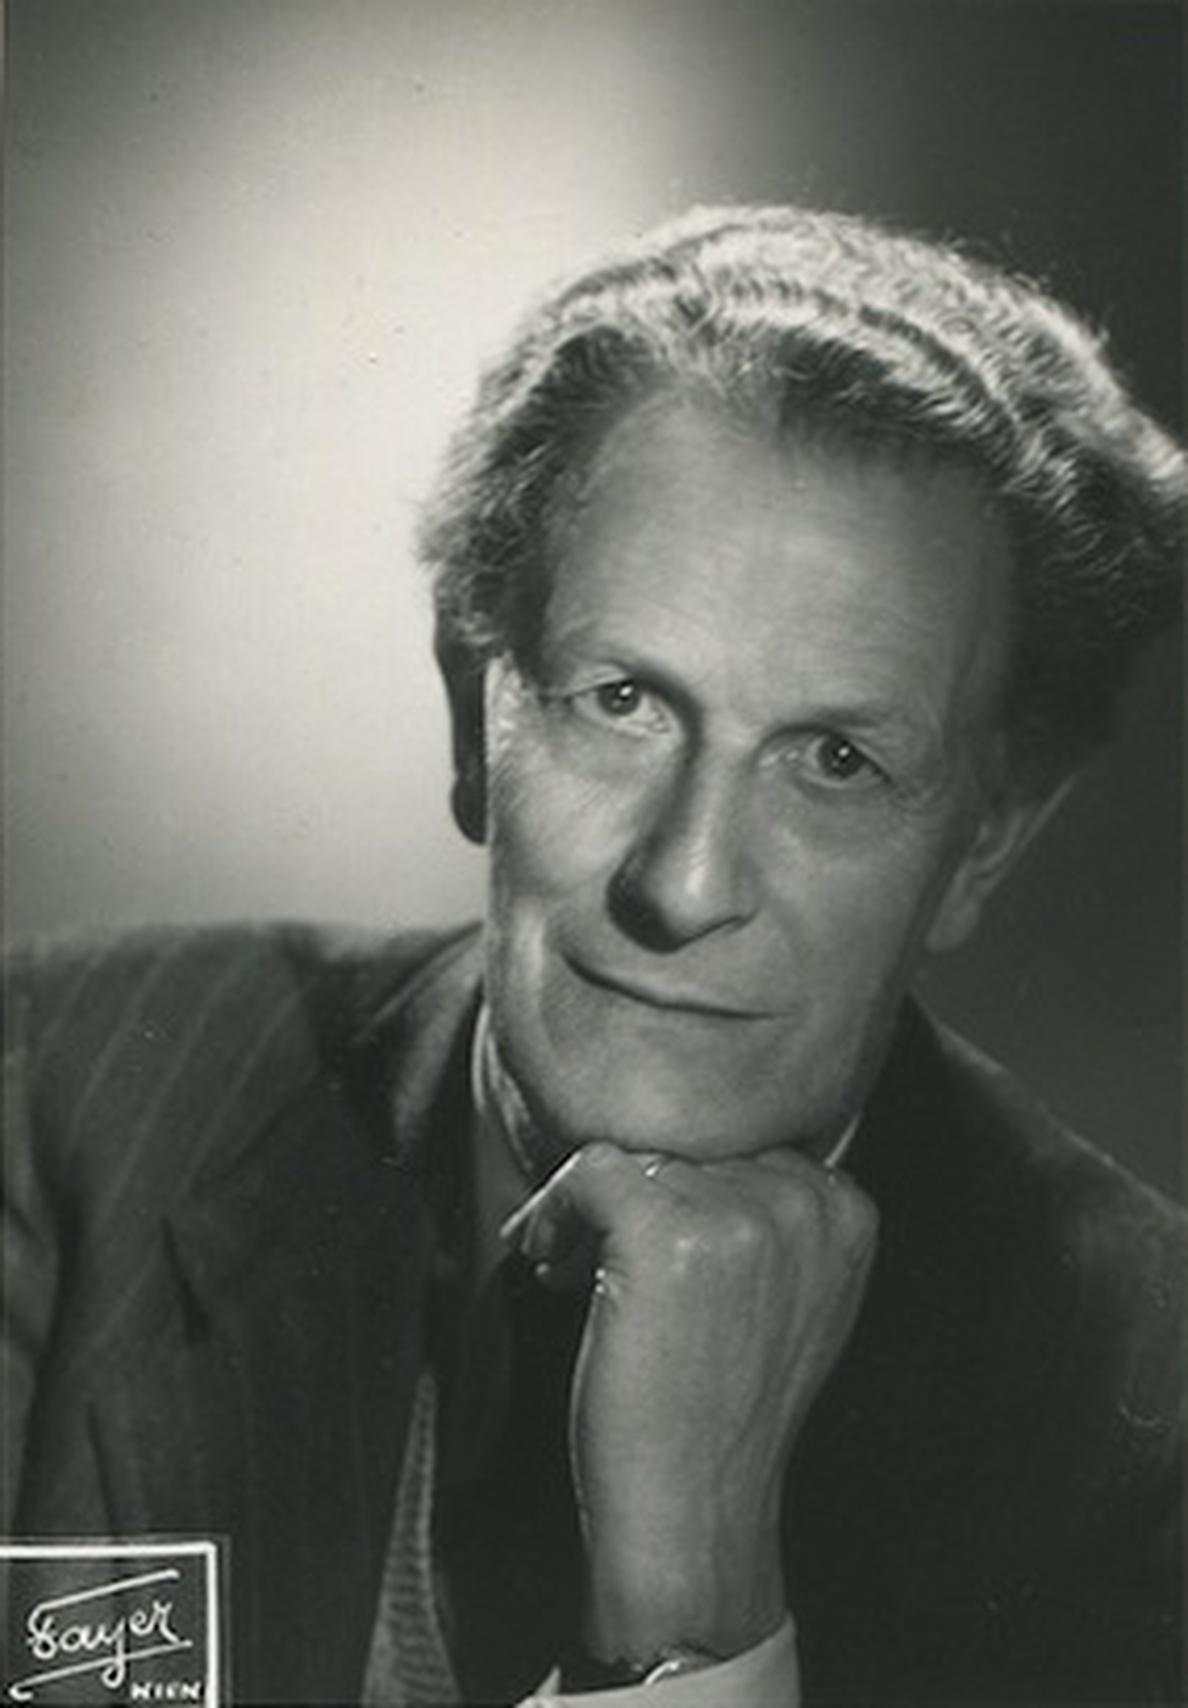 Frank MARTIN, photo de l'agence Fayer, Vienne, date ??